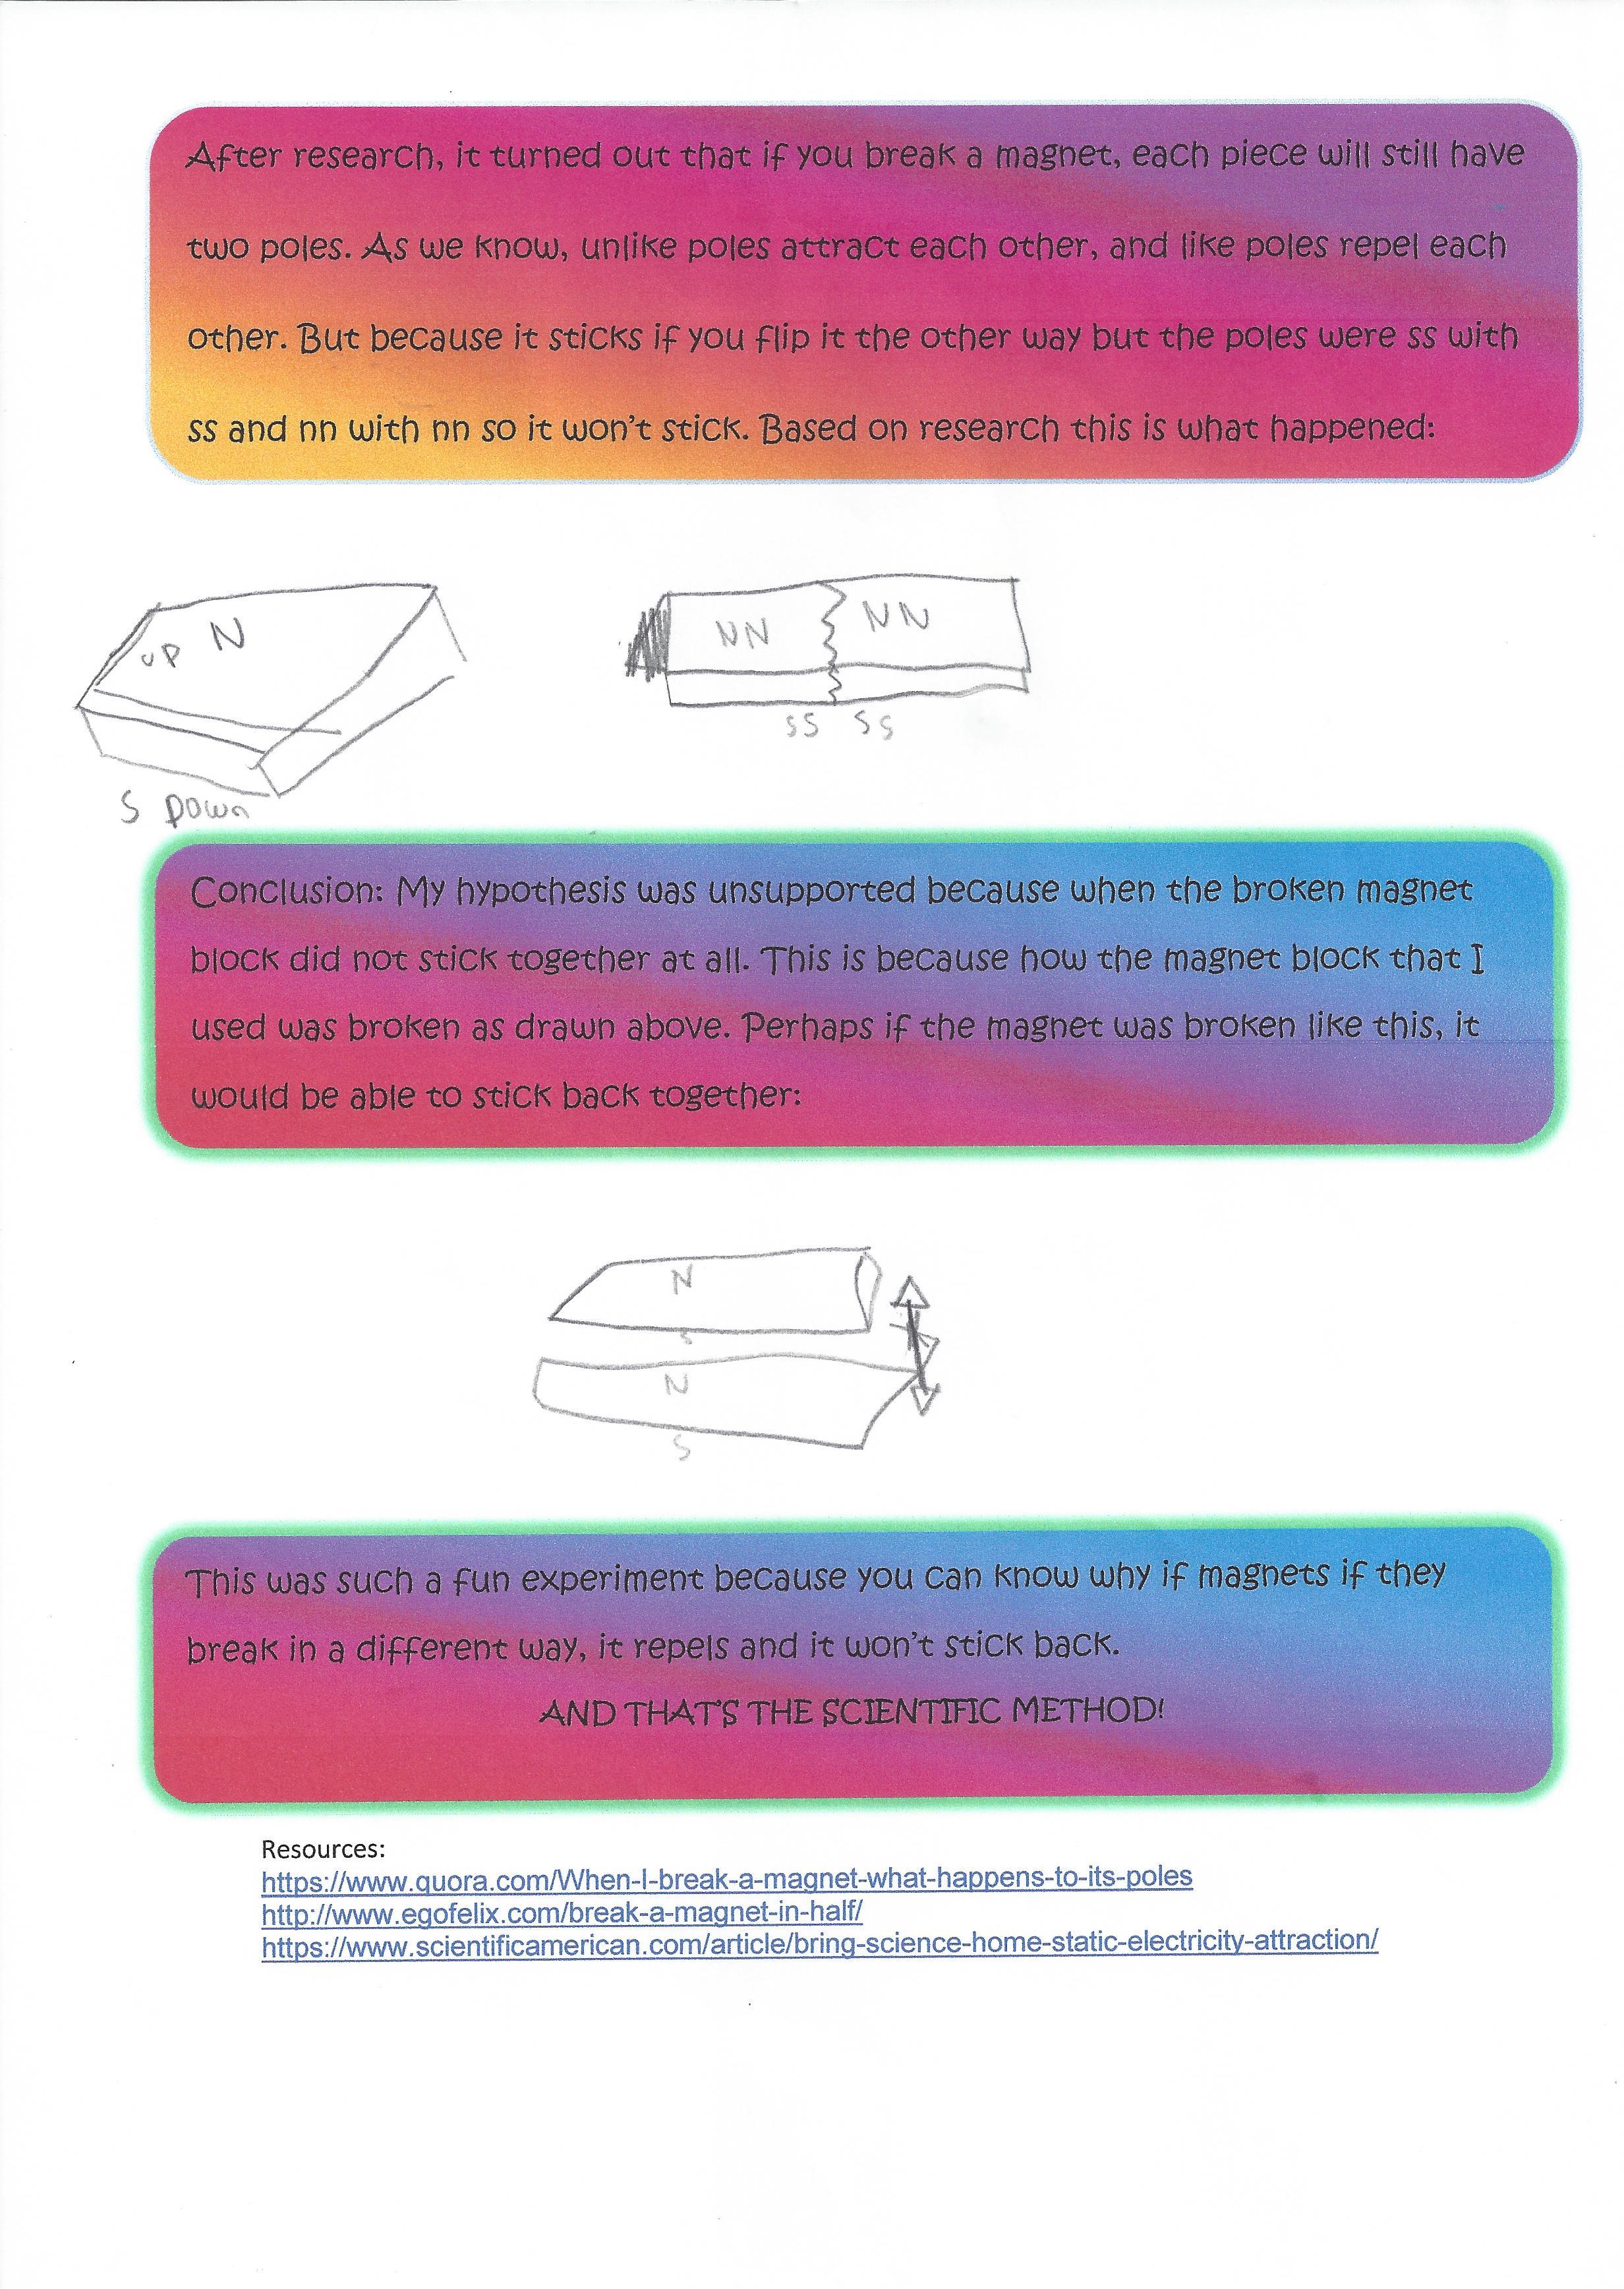 10-The-Scientific-Method_Page_06_Azka